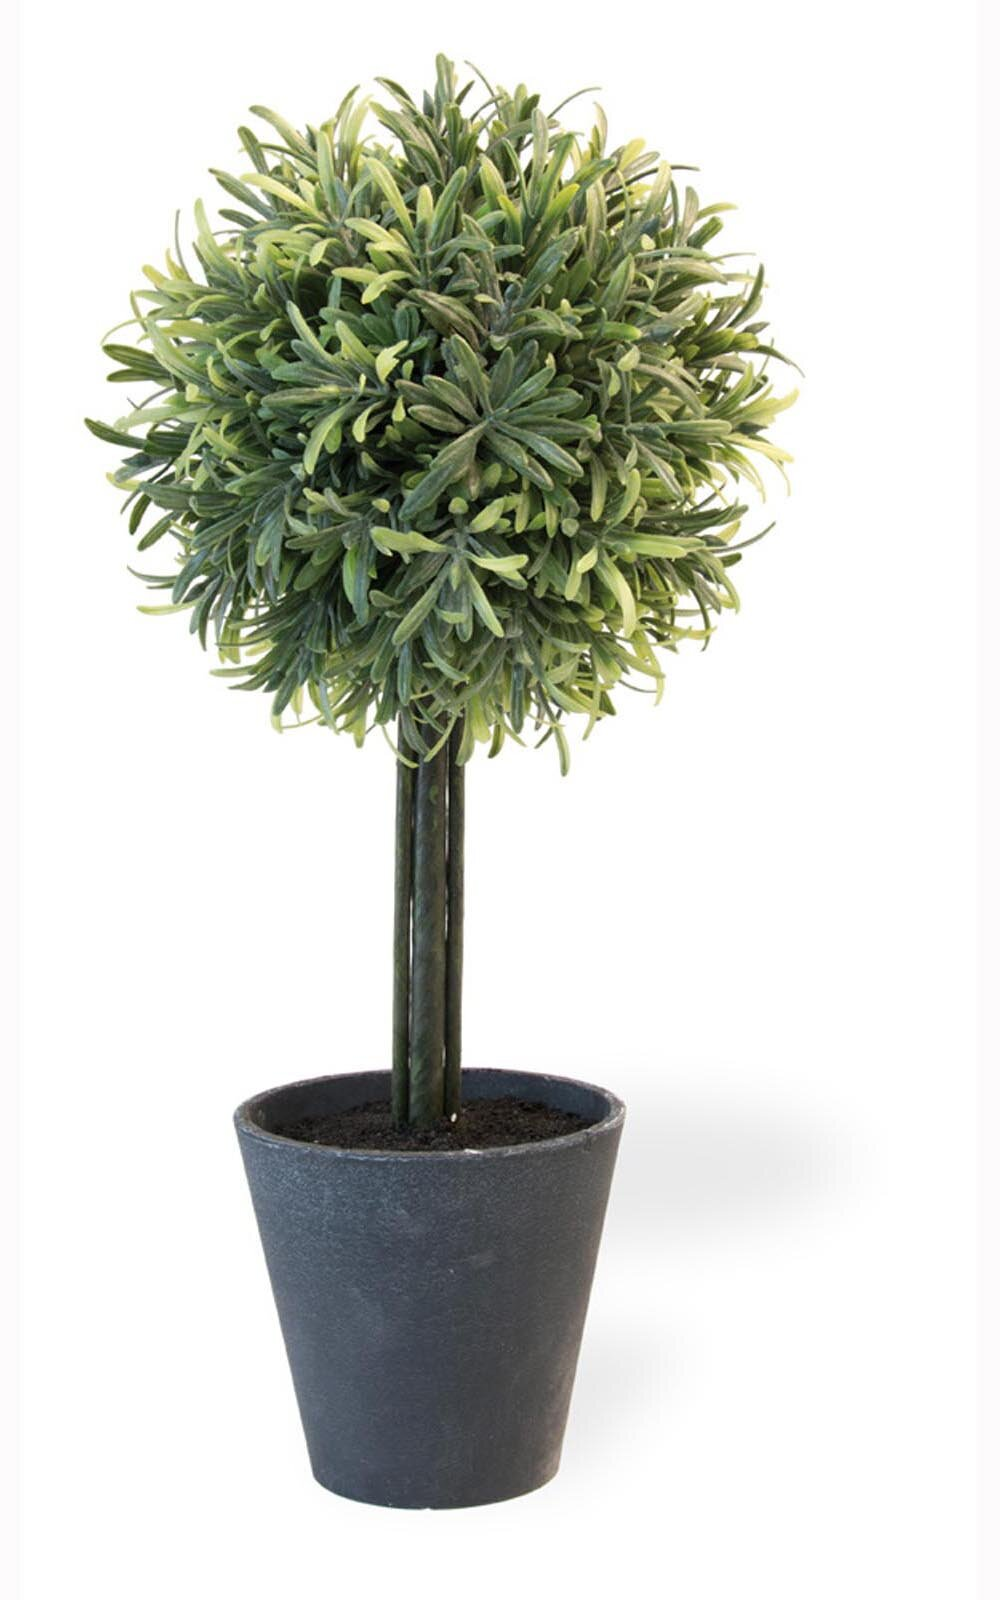 Fleur De Lis Living Rosemary Herbs Topiary In Pot Wayfair